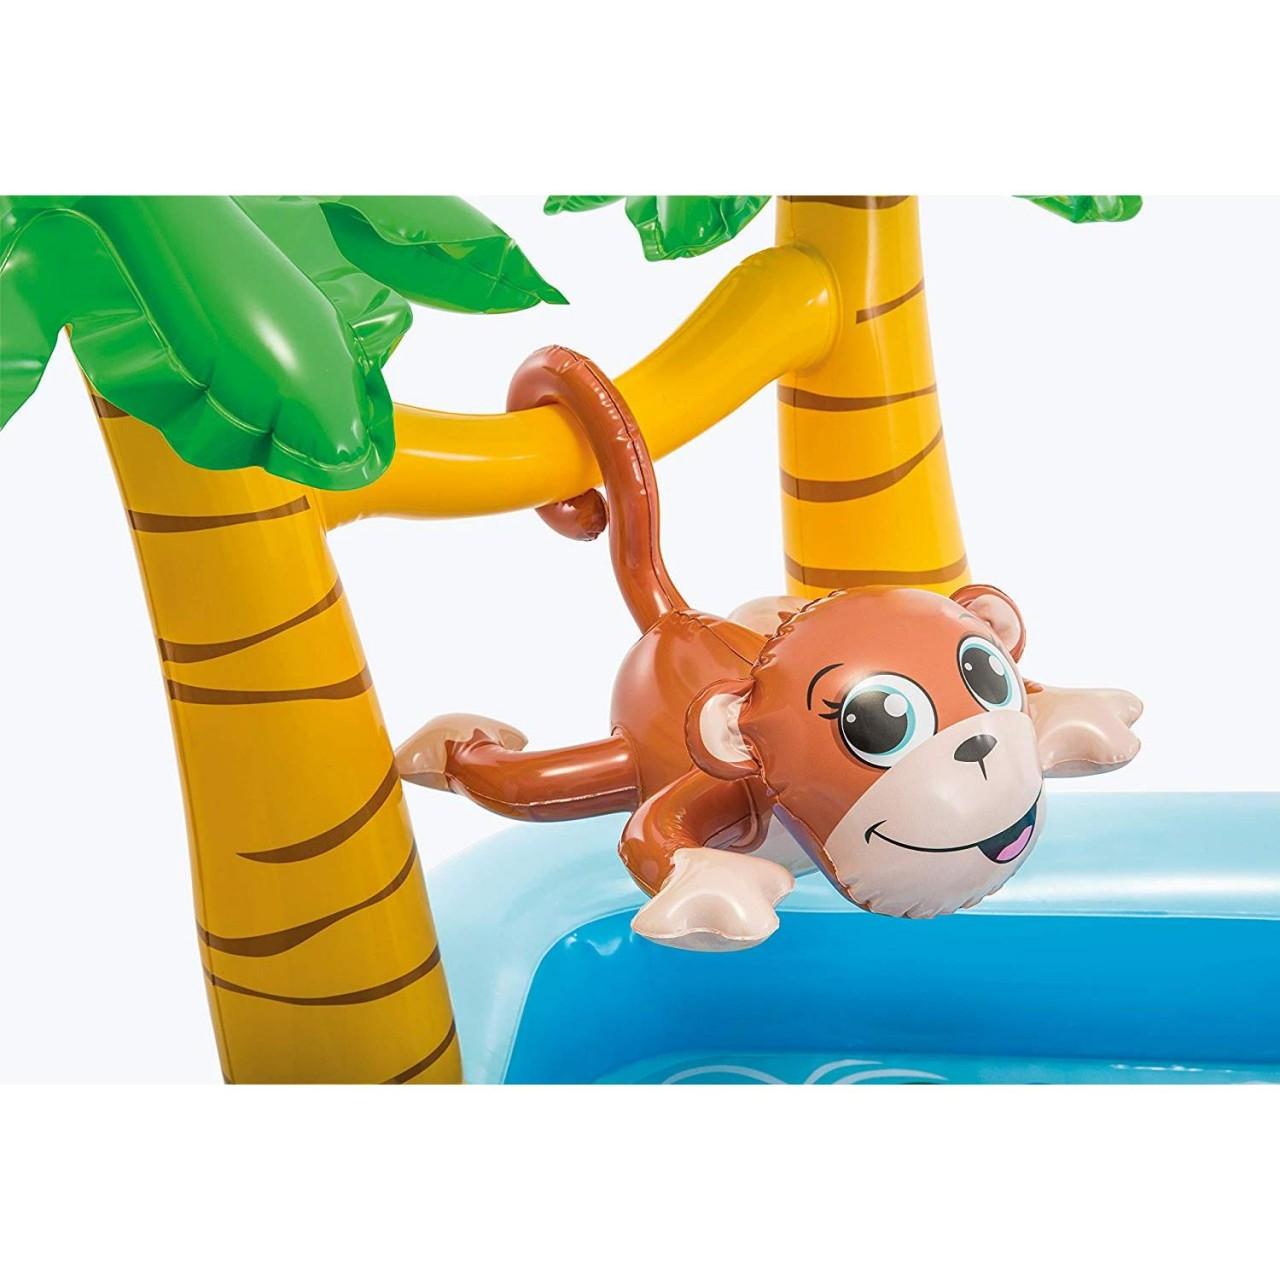 Intex Play Center Jungle Adventure Planschbecken Pool Wasserrutsche aufblasbar